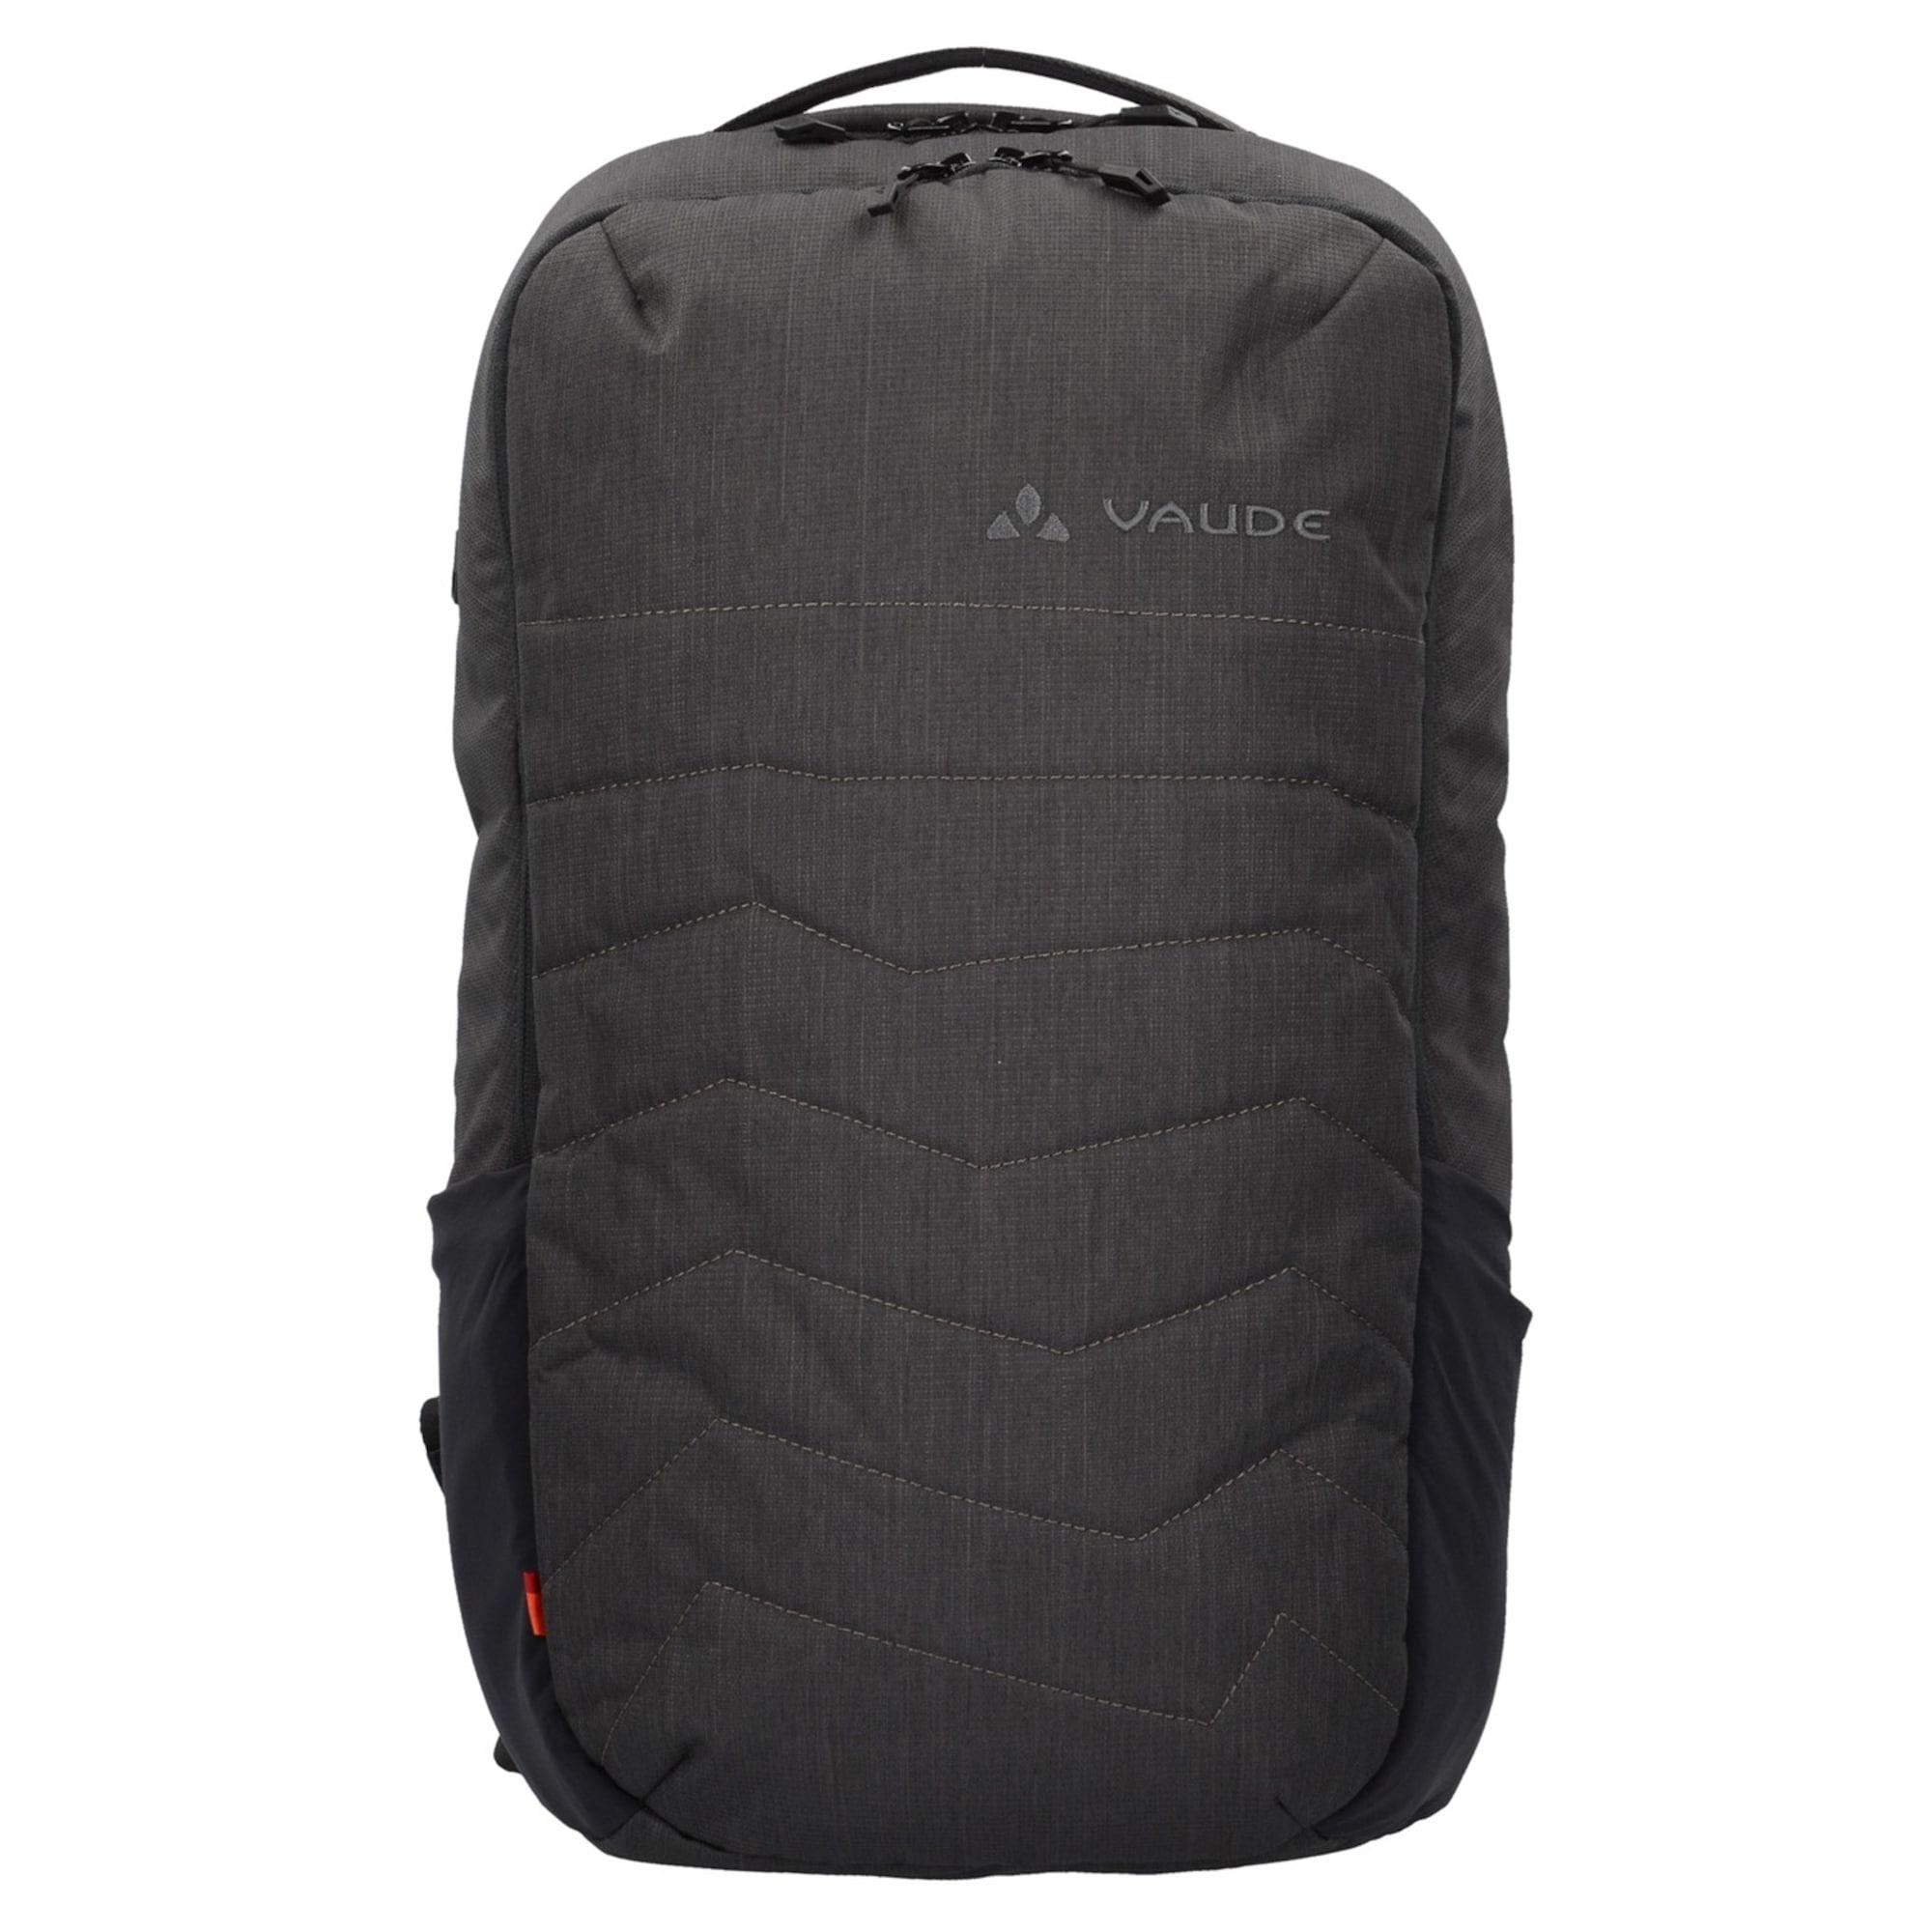 'PETAIR' Daypack | Taschen > Rucksäcke > Tagesrucksäcke | Vaude